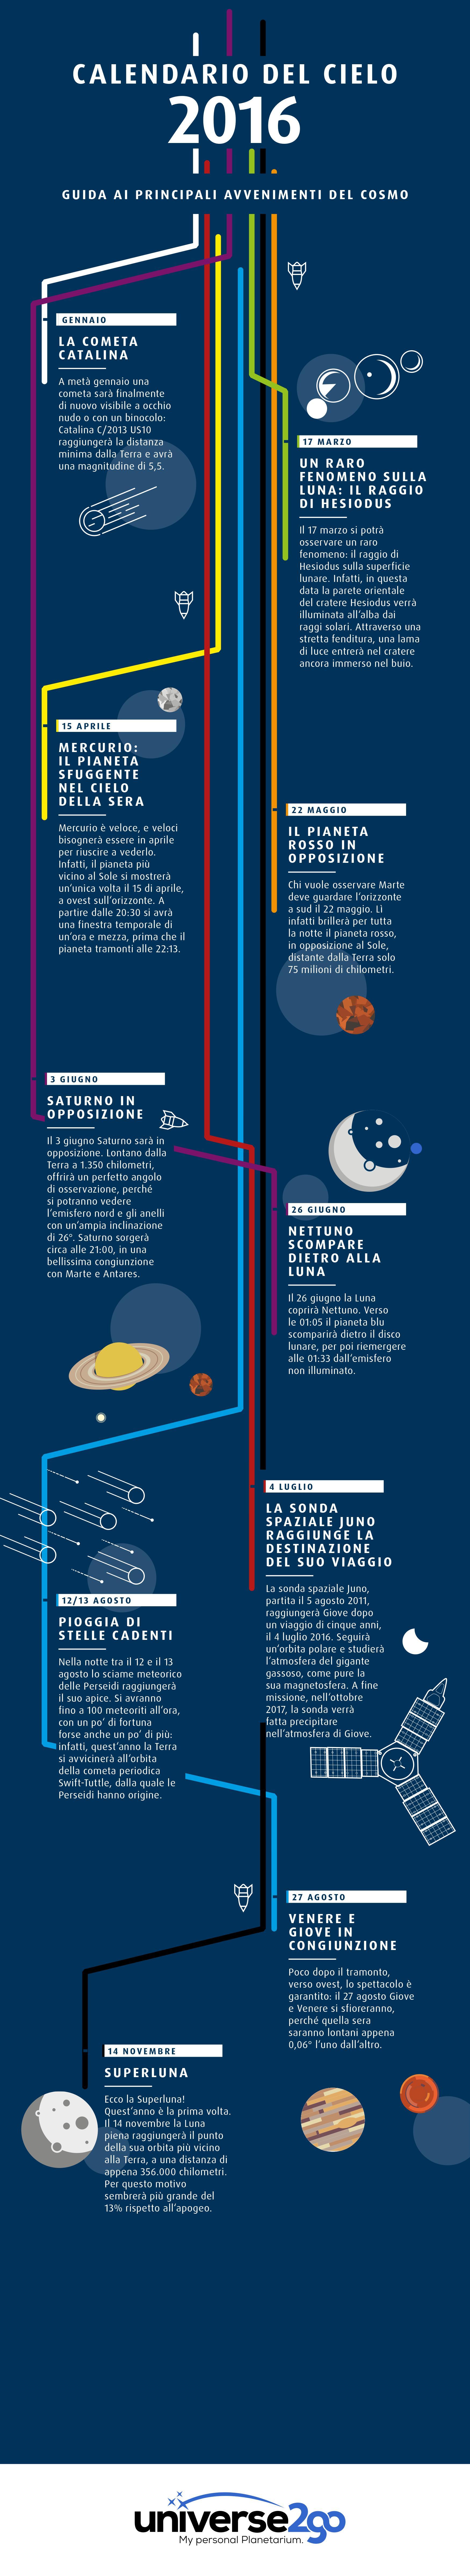 Infografica - Calendario del Cielo 2016